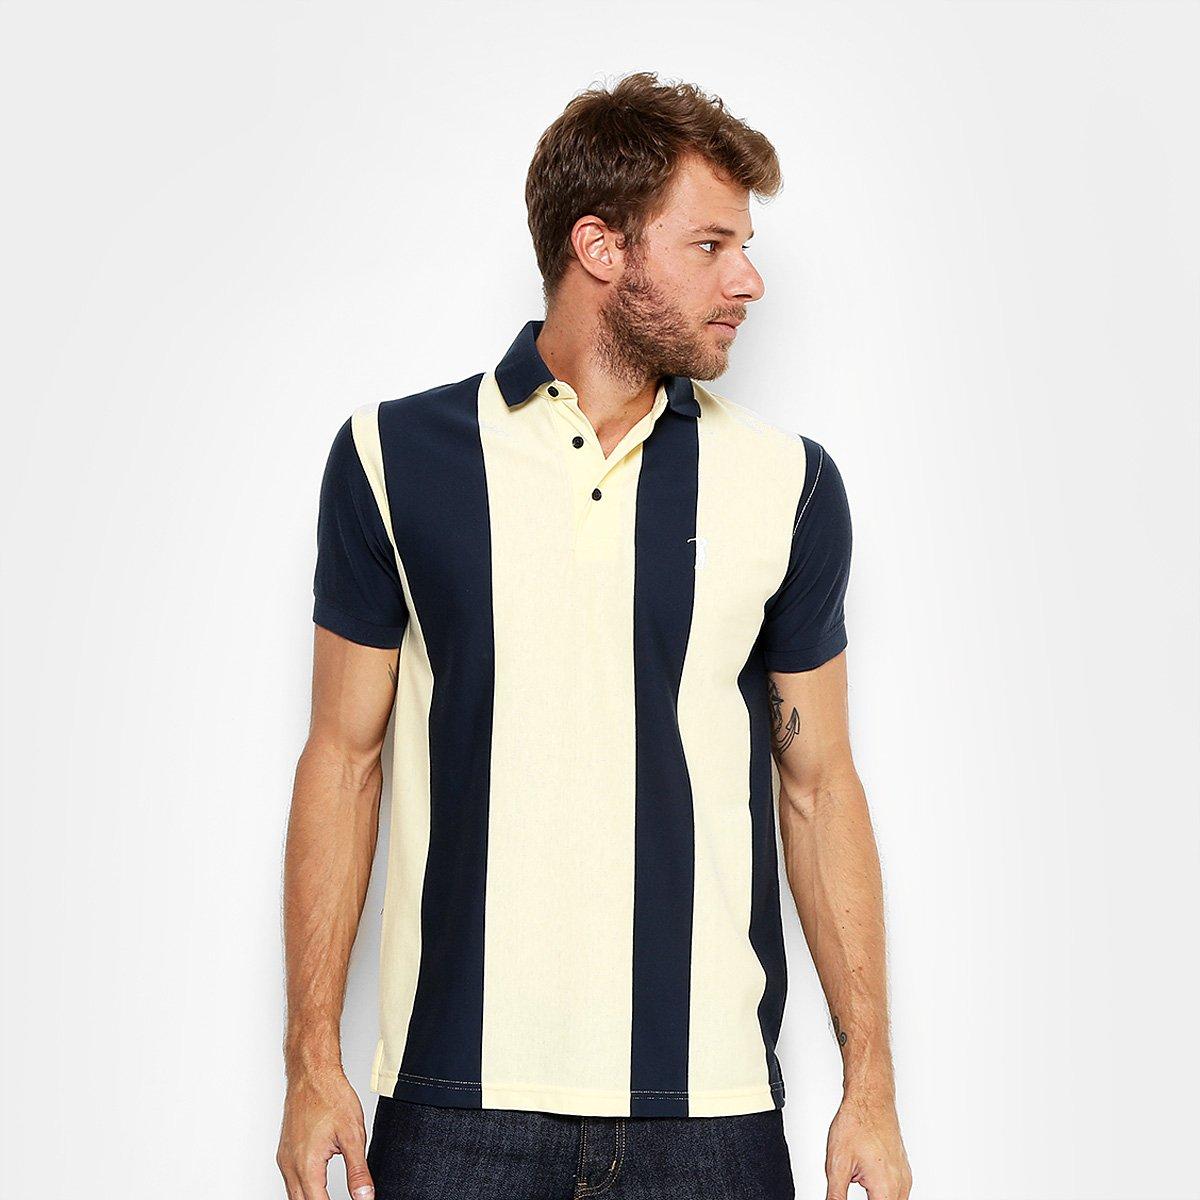 Camisa Polo Aleatory Malha Fio Tinto Vertical Masculina - Compre ... 86e5d29ebf195